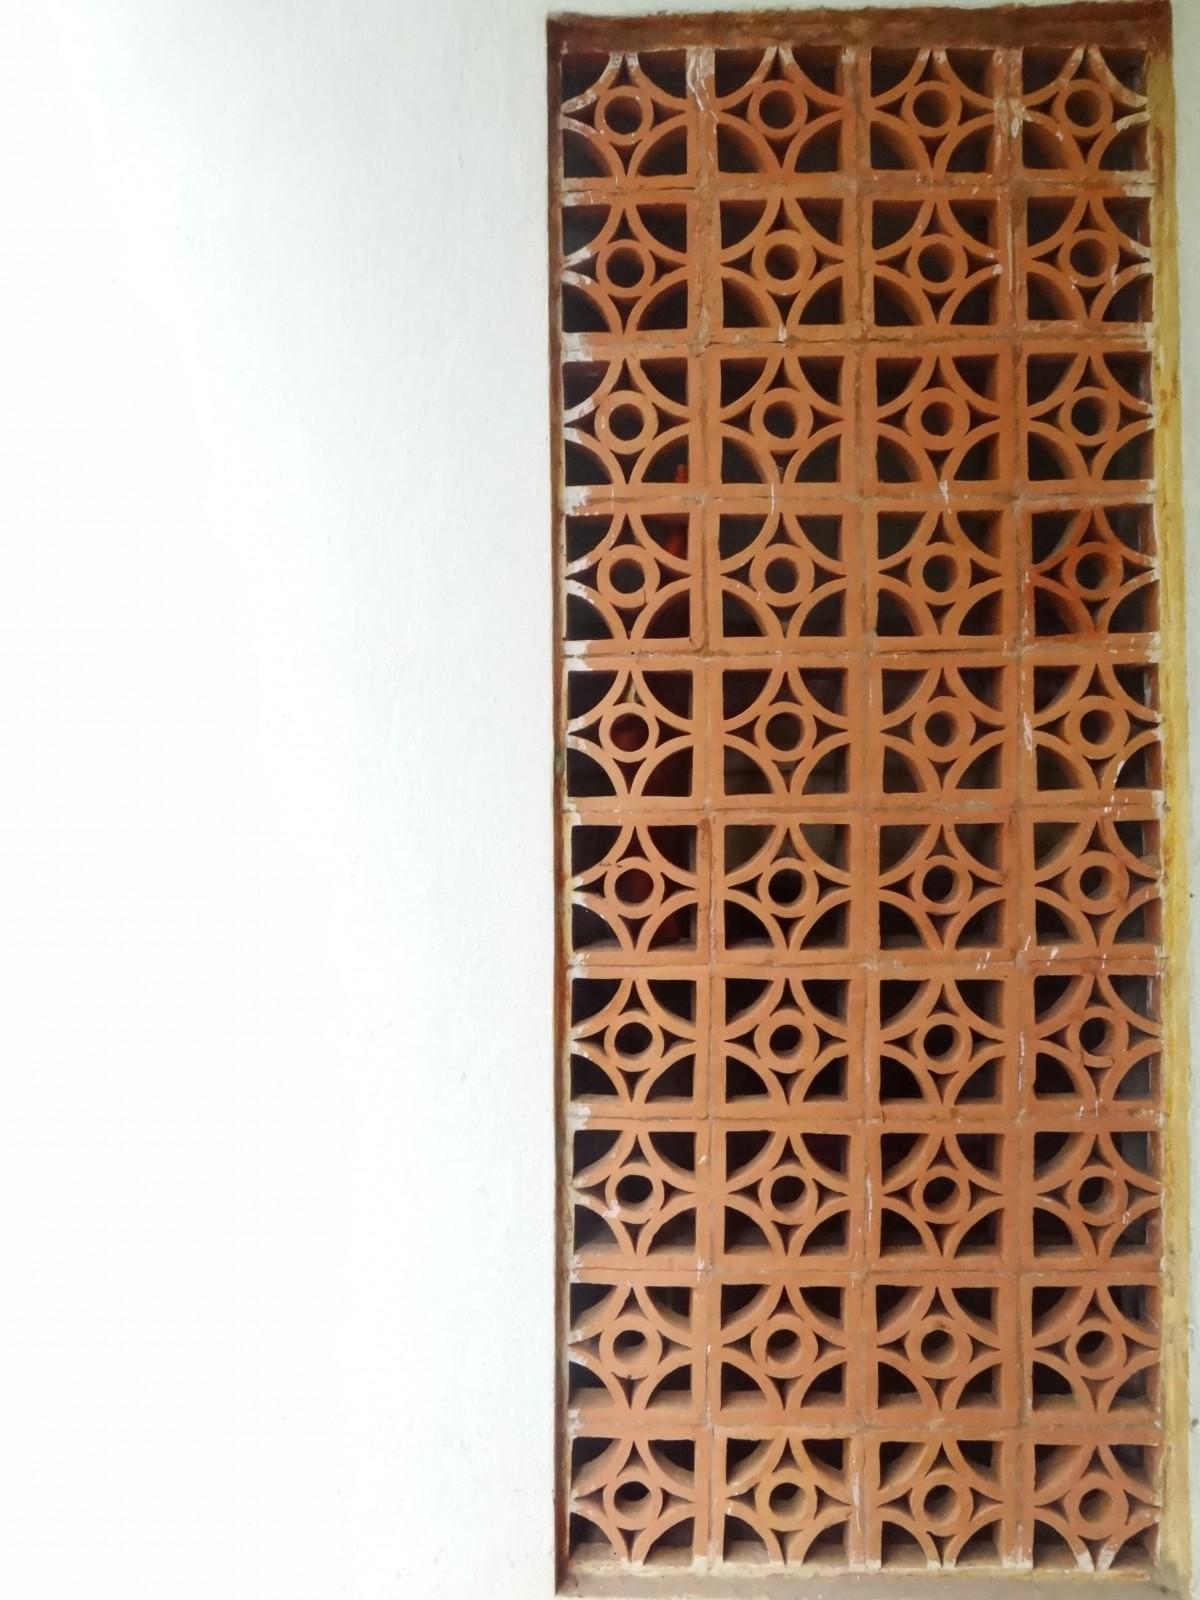 free images wood floor pattern furniture door interior design rh pxhere com